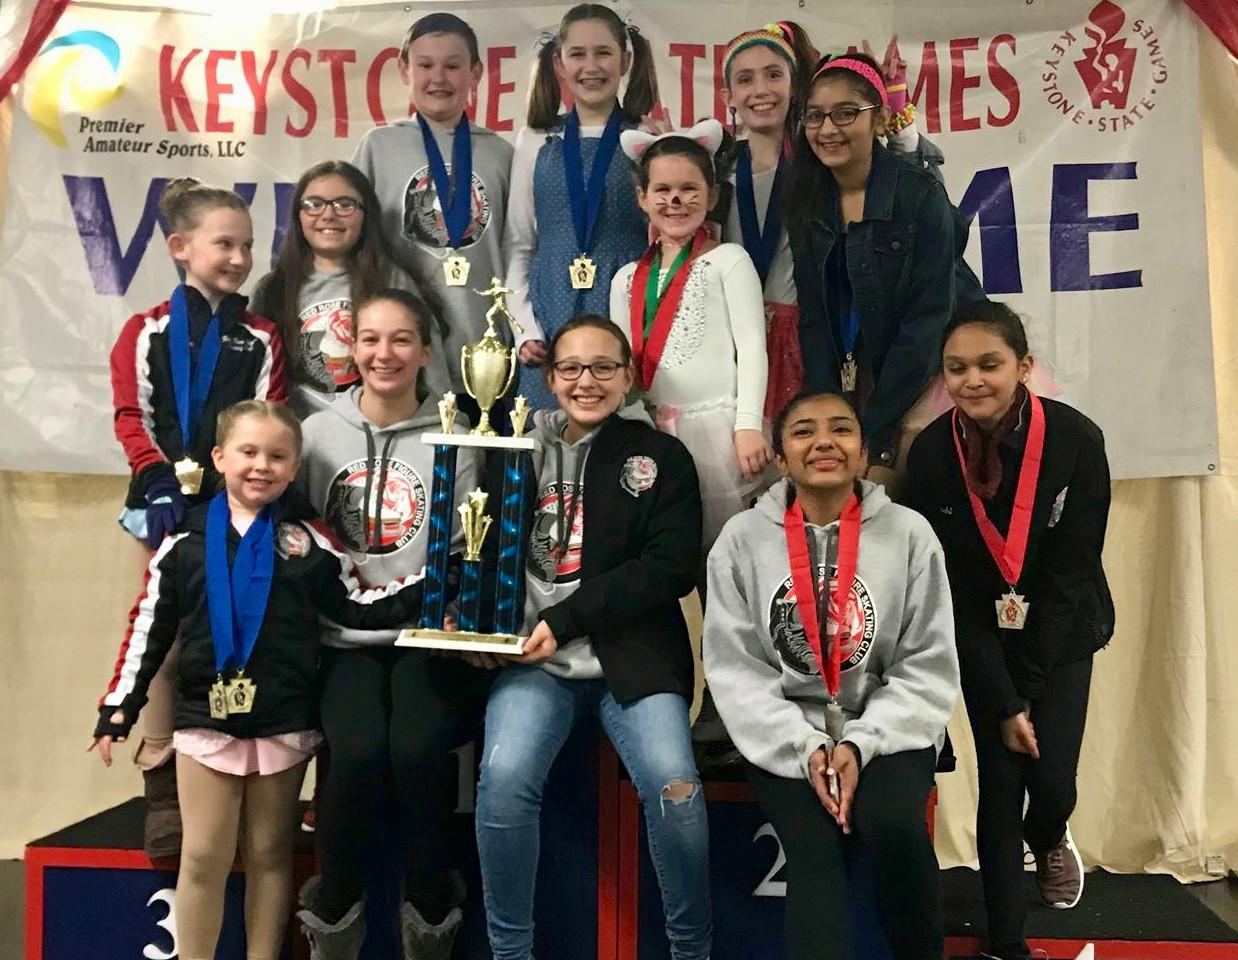 Keystone State Games 2019